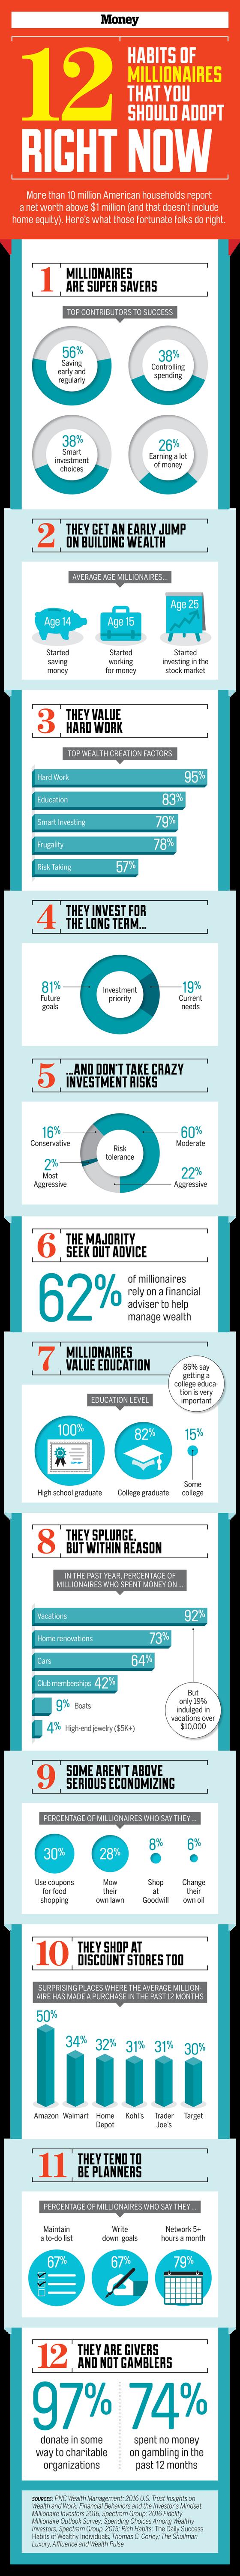 12-habits-of-millionaires